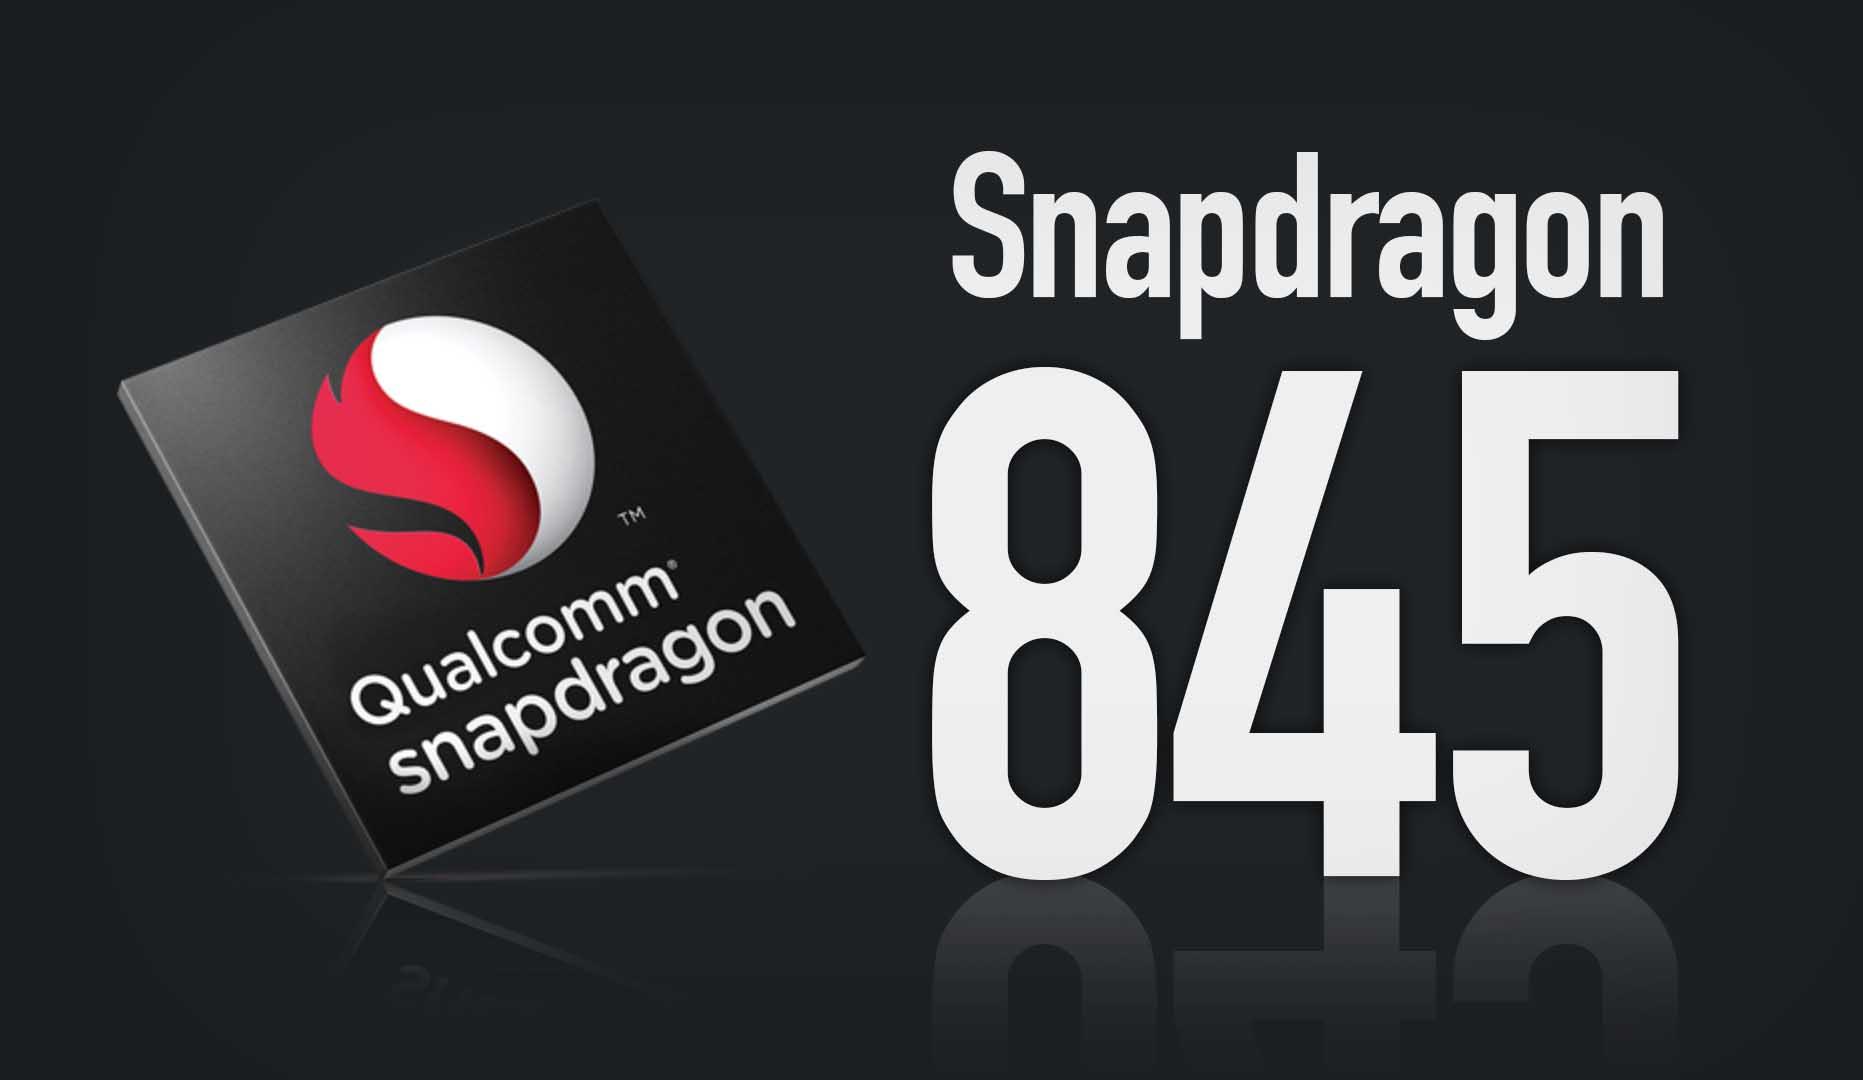 Qualcomm представила флагманский процессор Snapdragon 845